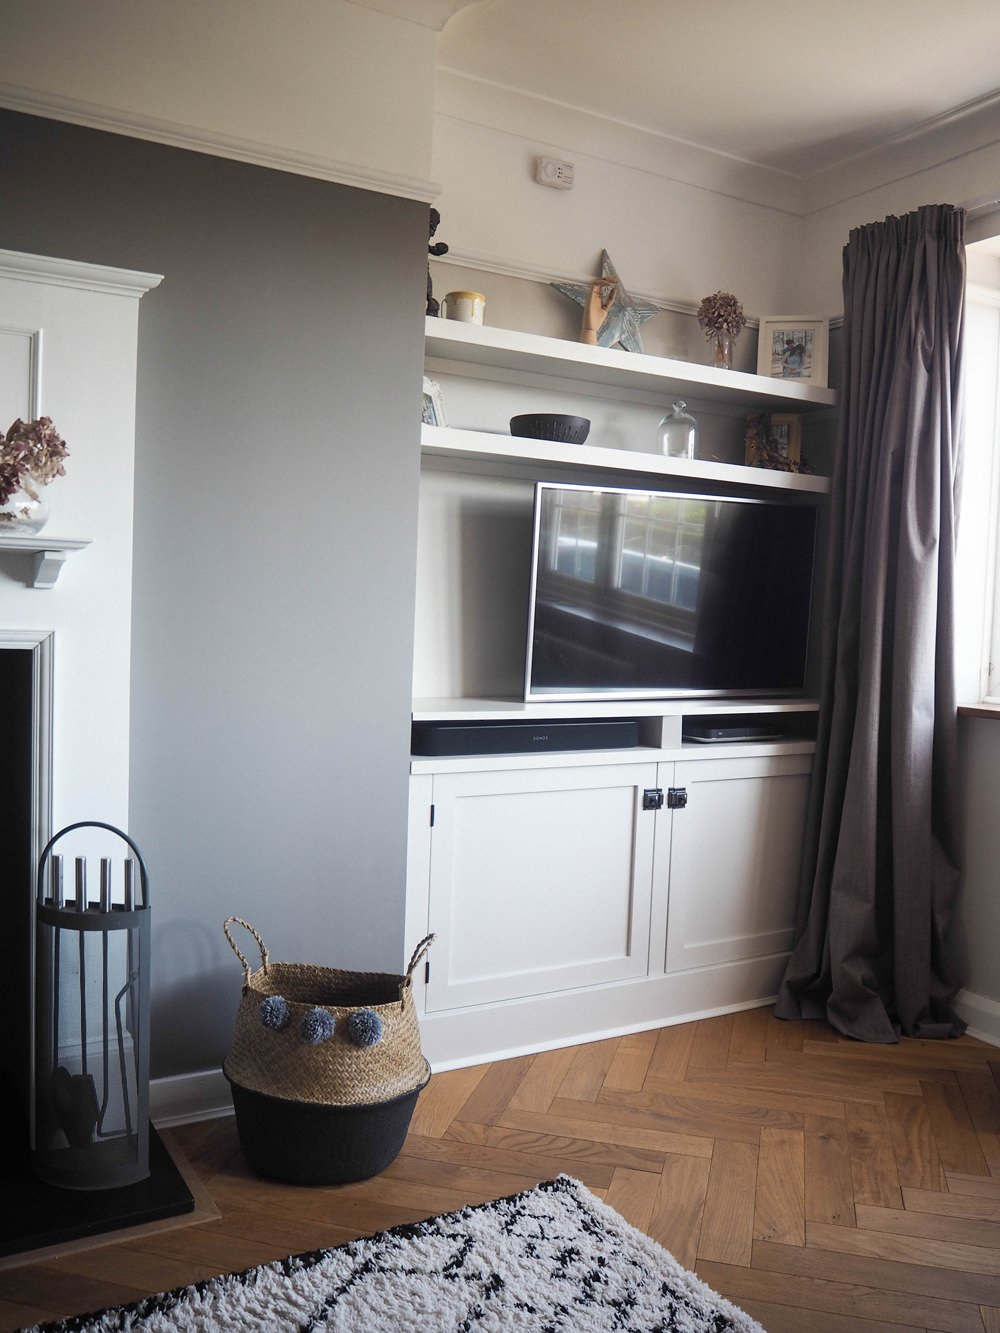 1930s House Living Room Renovation Built In TV Cupboard Alcove Shelf Shelving DIY